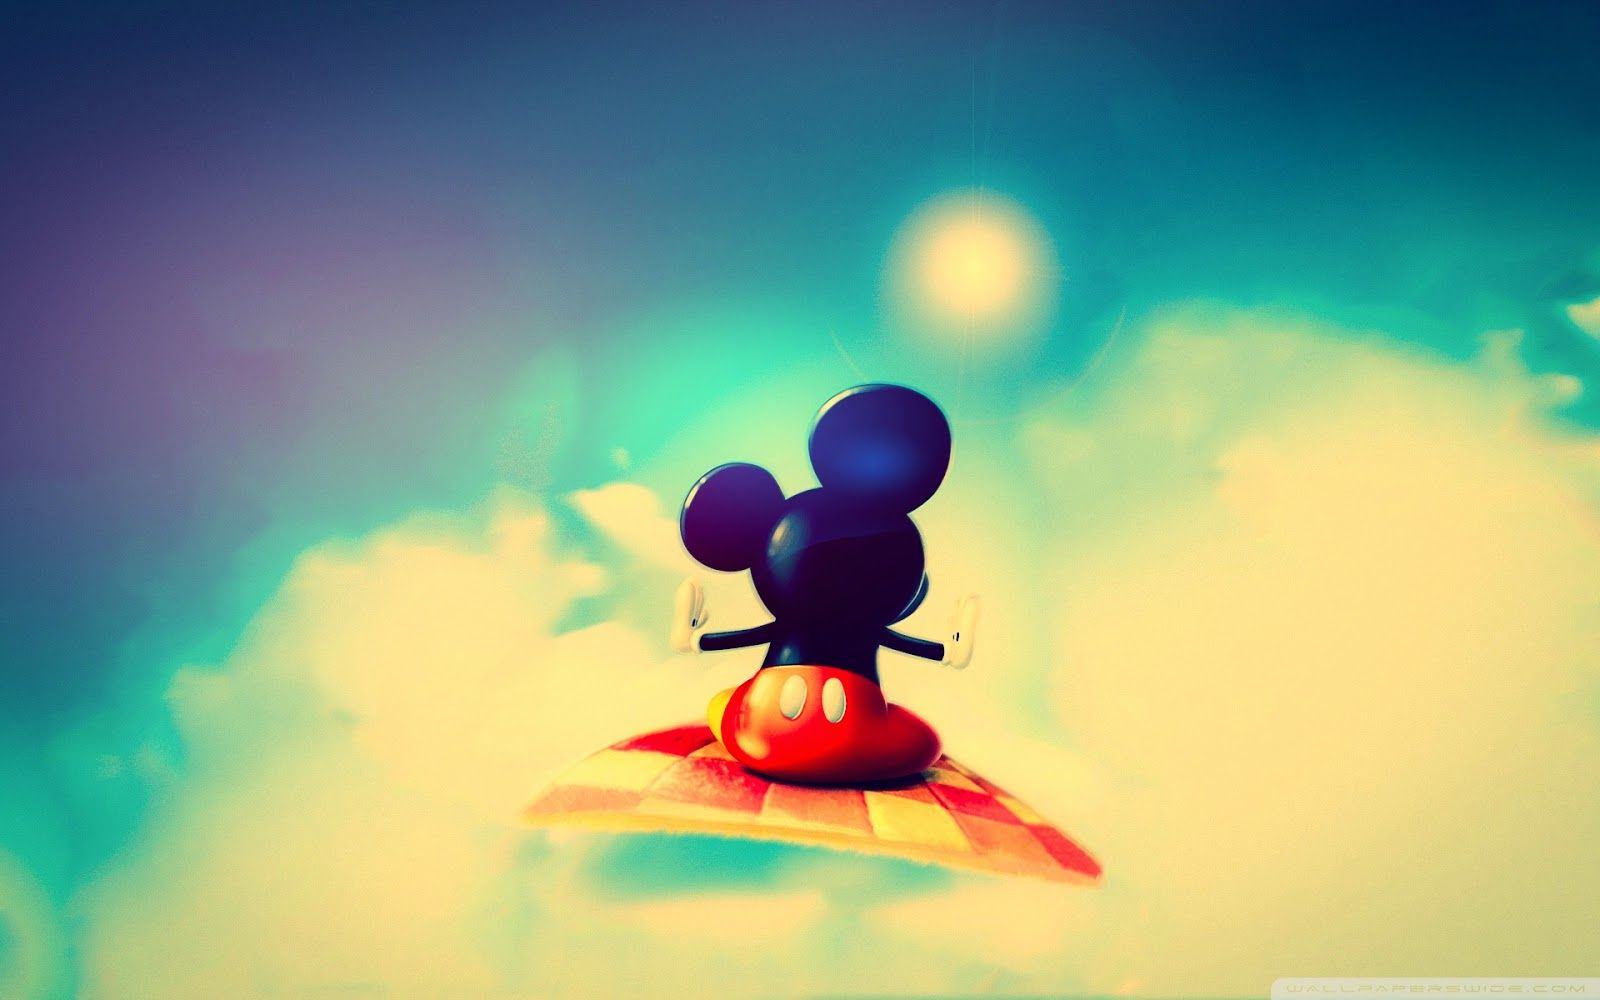 Mickey Mouse Desktop Background Disney Desktop Wallpaper Mickey Mouse Wallpaper Mickey Mouse Pictures